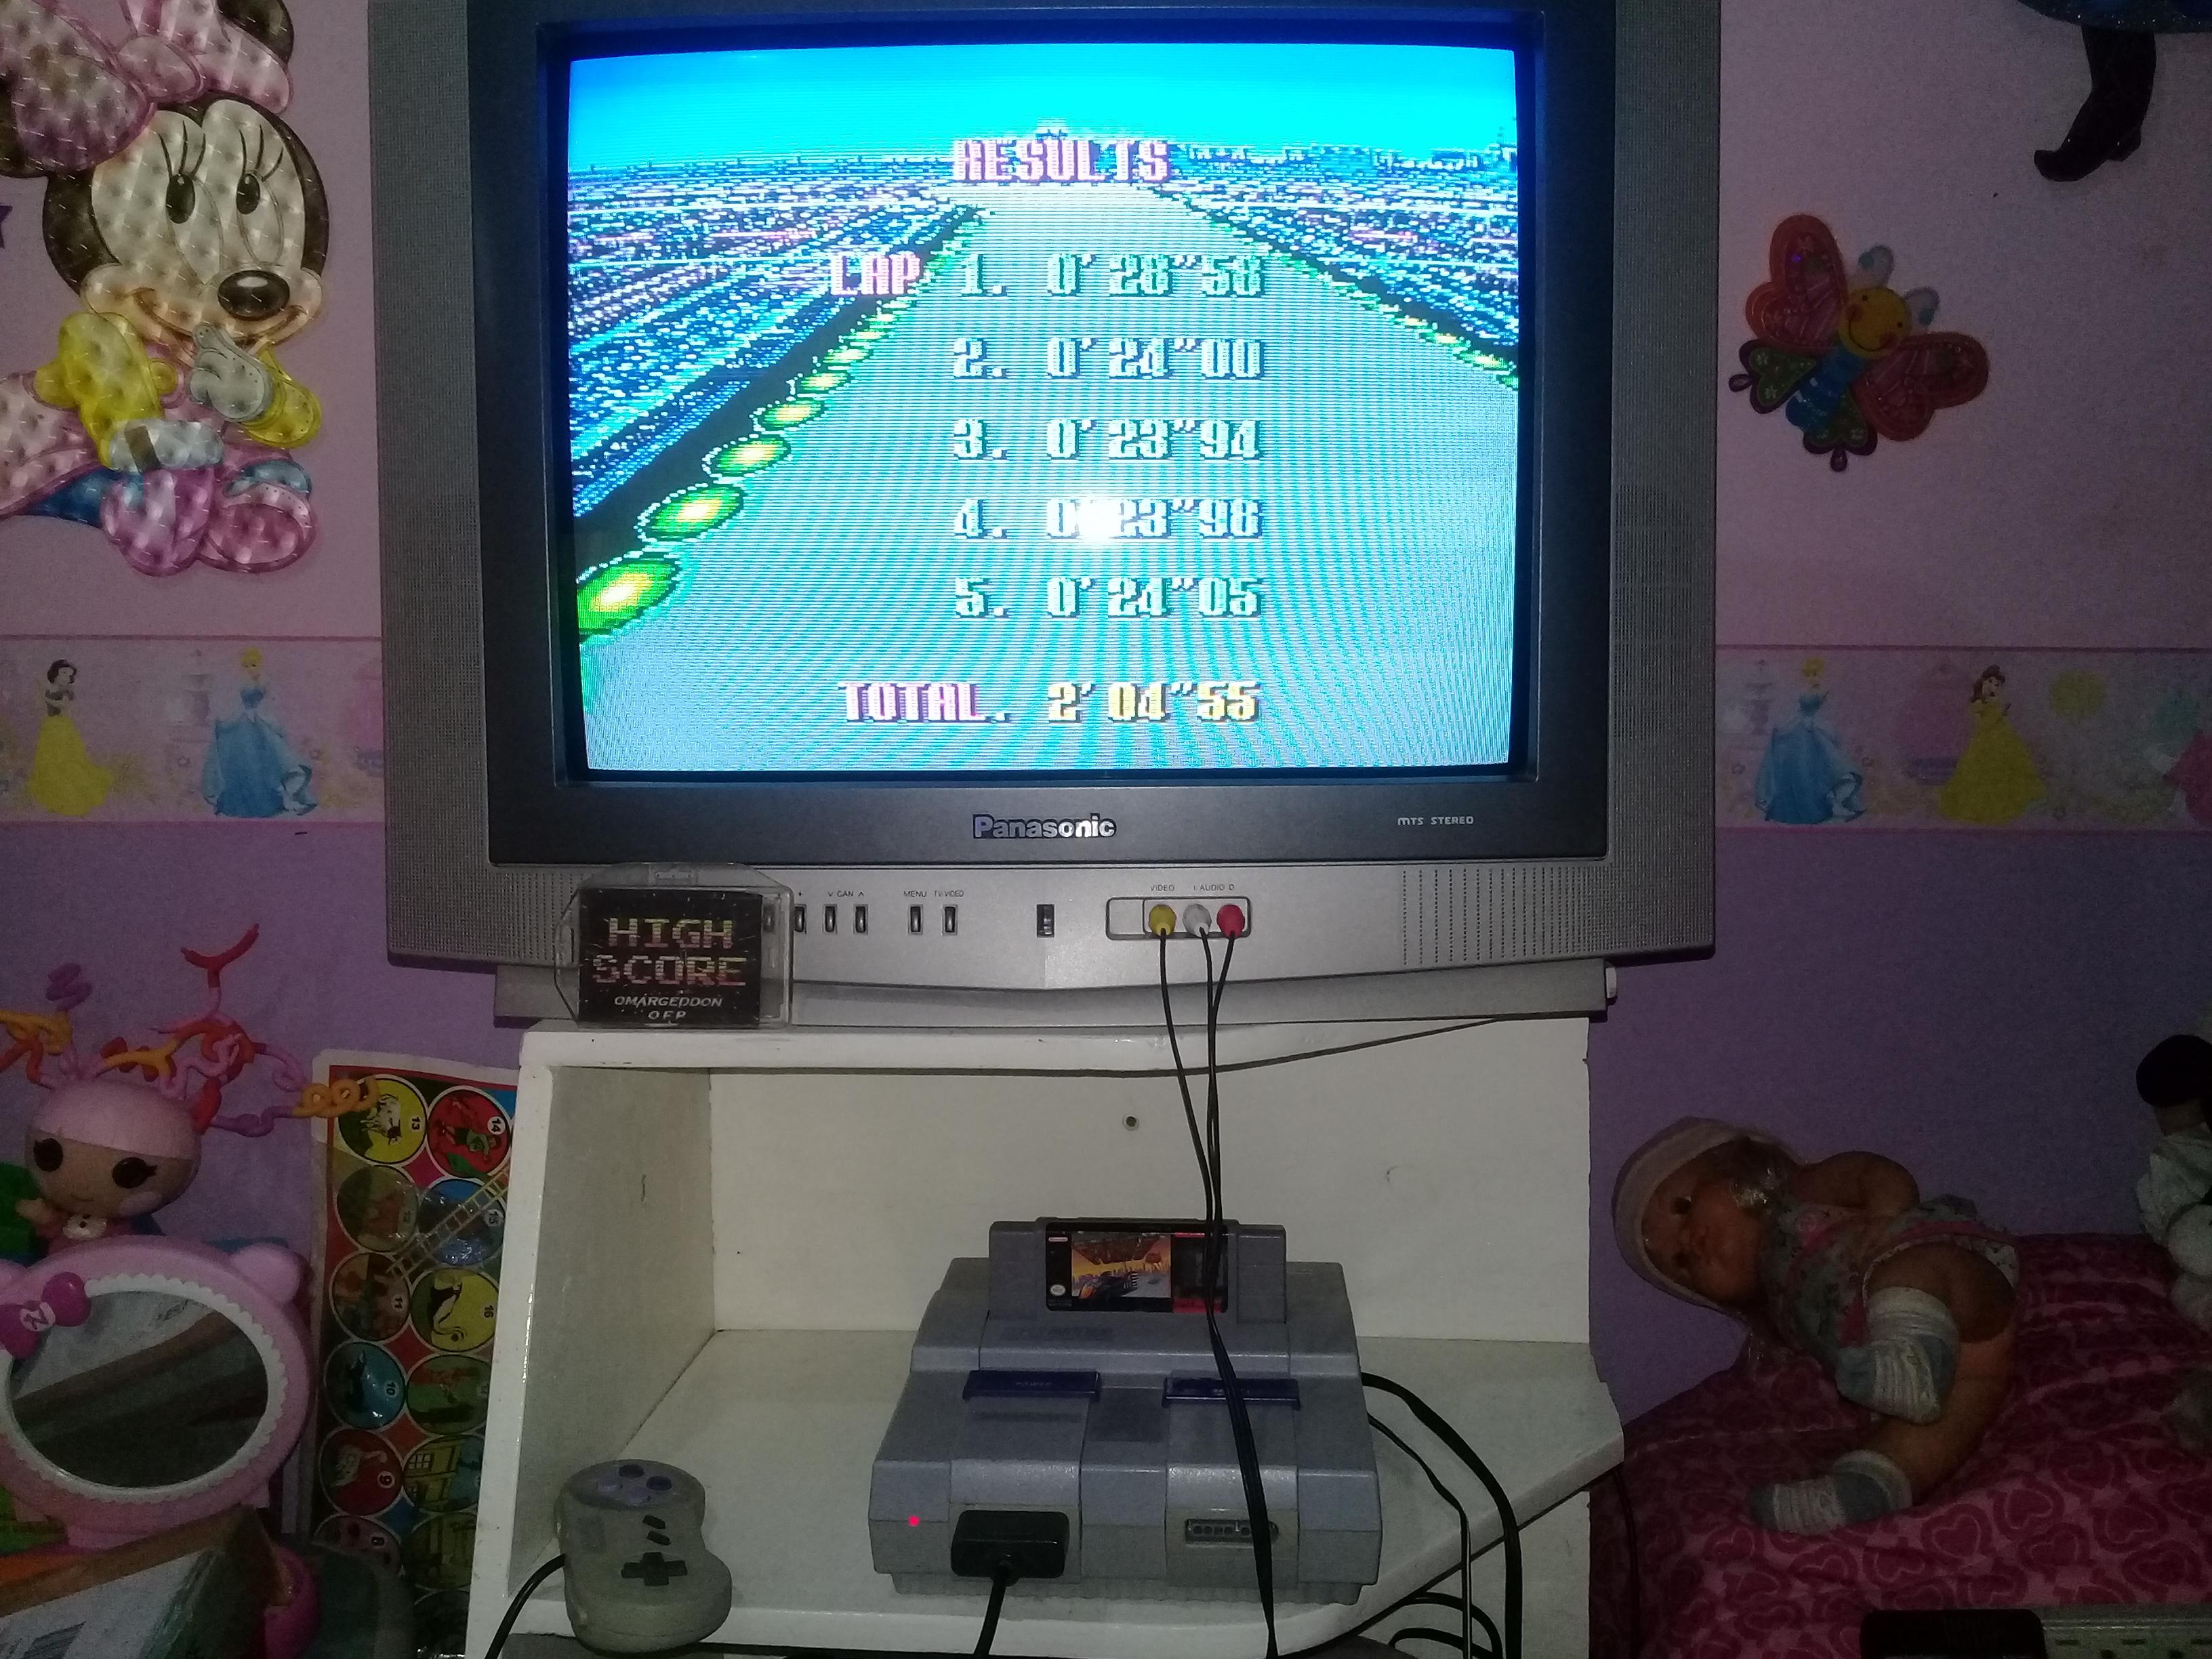 omargeddon: F-Zero: Practice [No Rival]: Mute City I (SNES/Super Famicom) 0:02:04.55 points on 2019-06-25 11:49:43